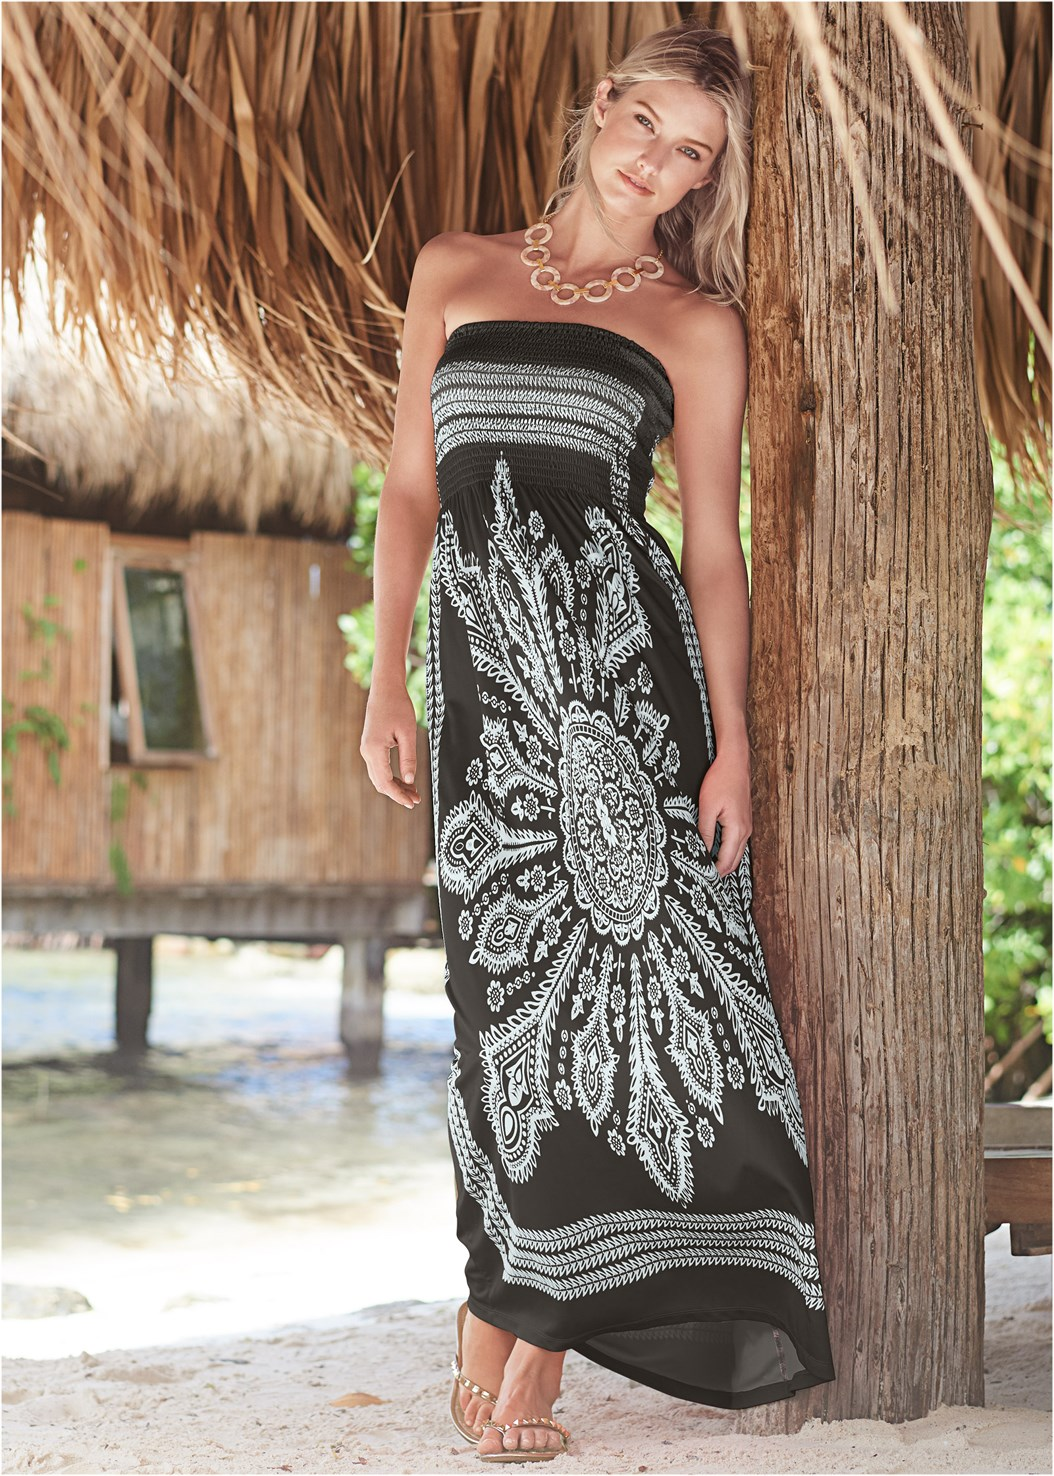 Bandeau Maxi Dress Cover-Up,Studded Flip Flops